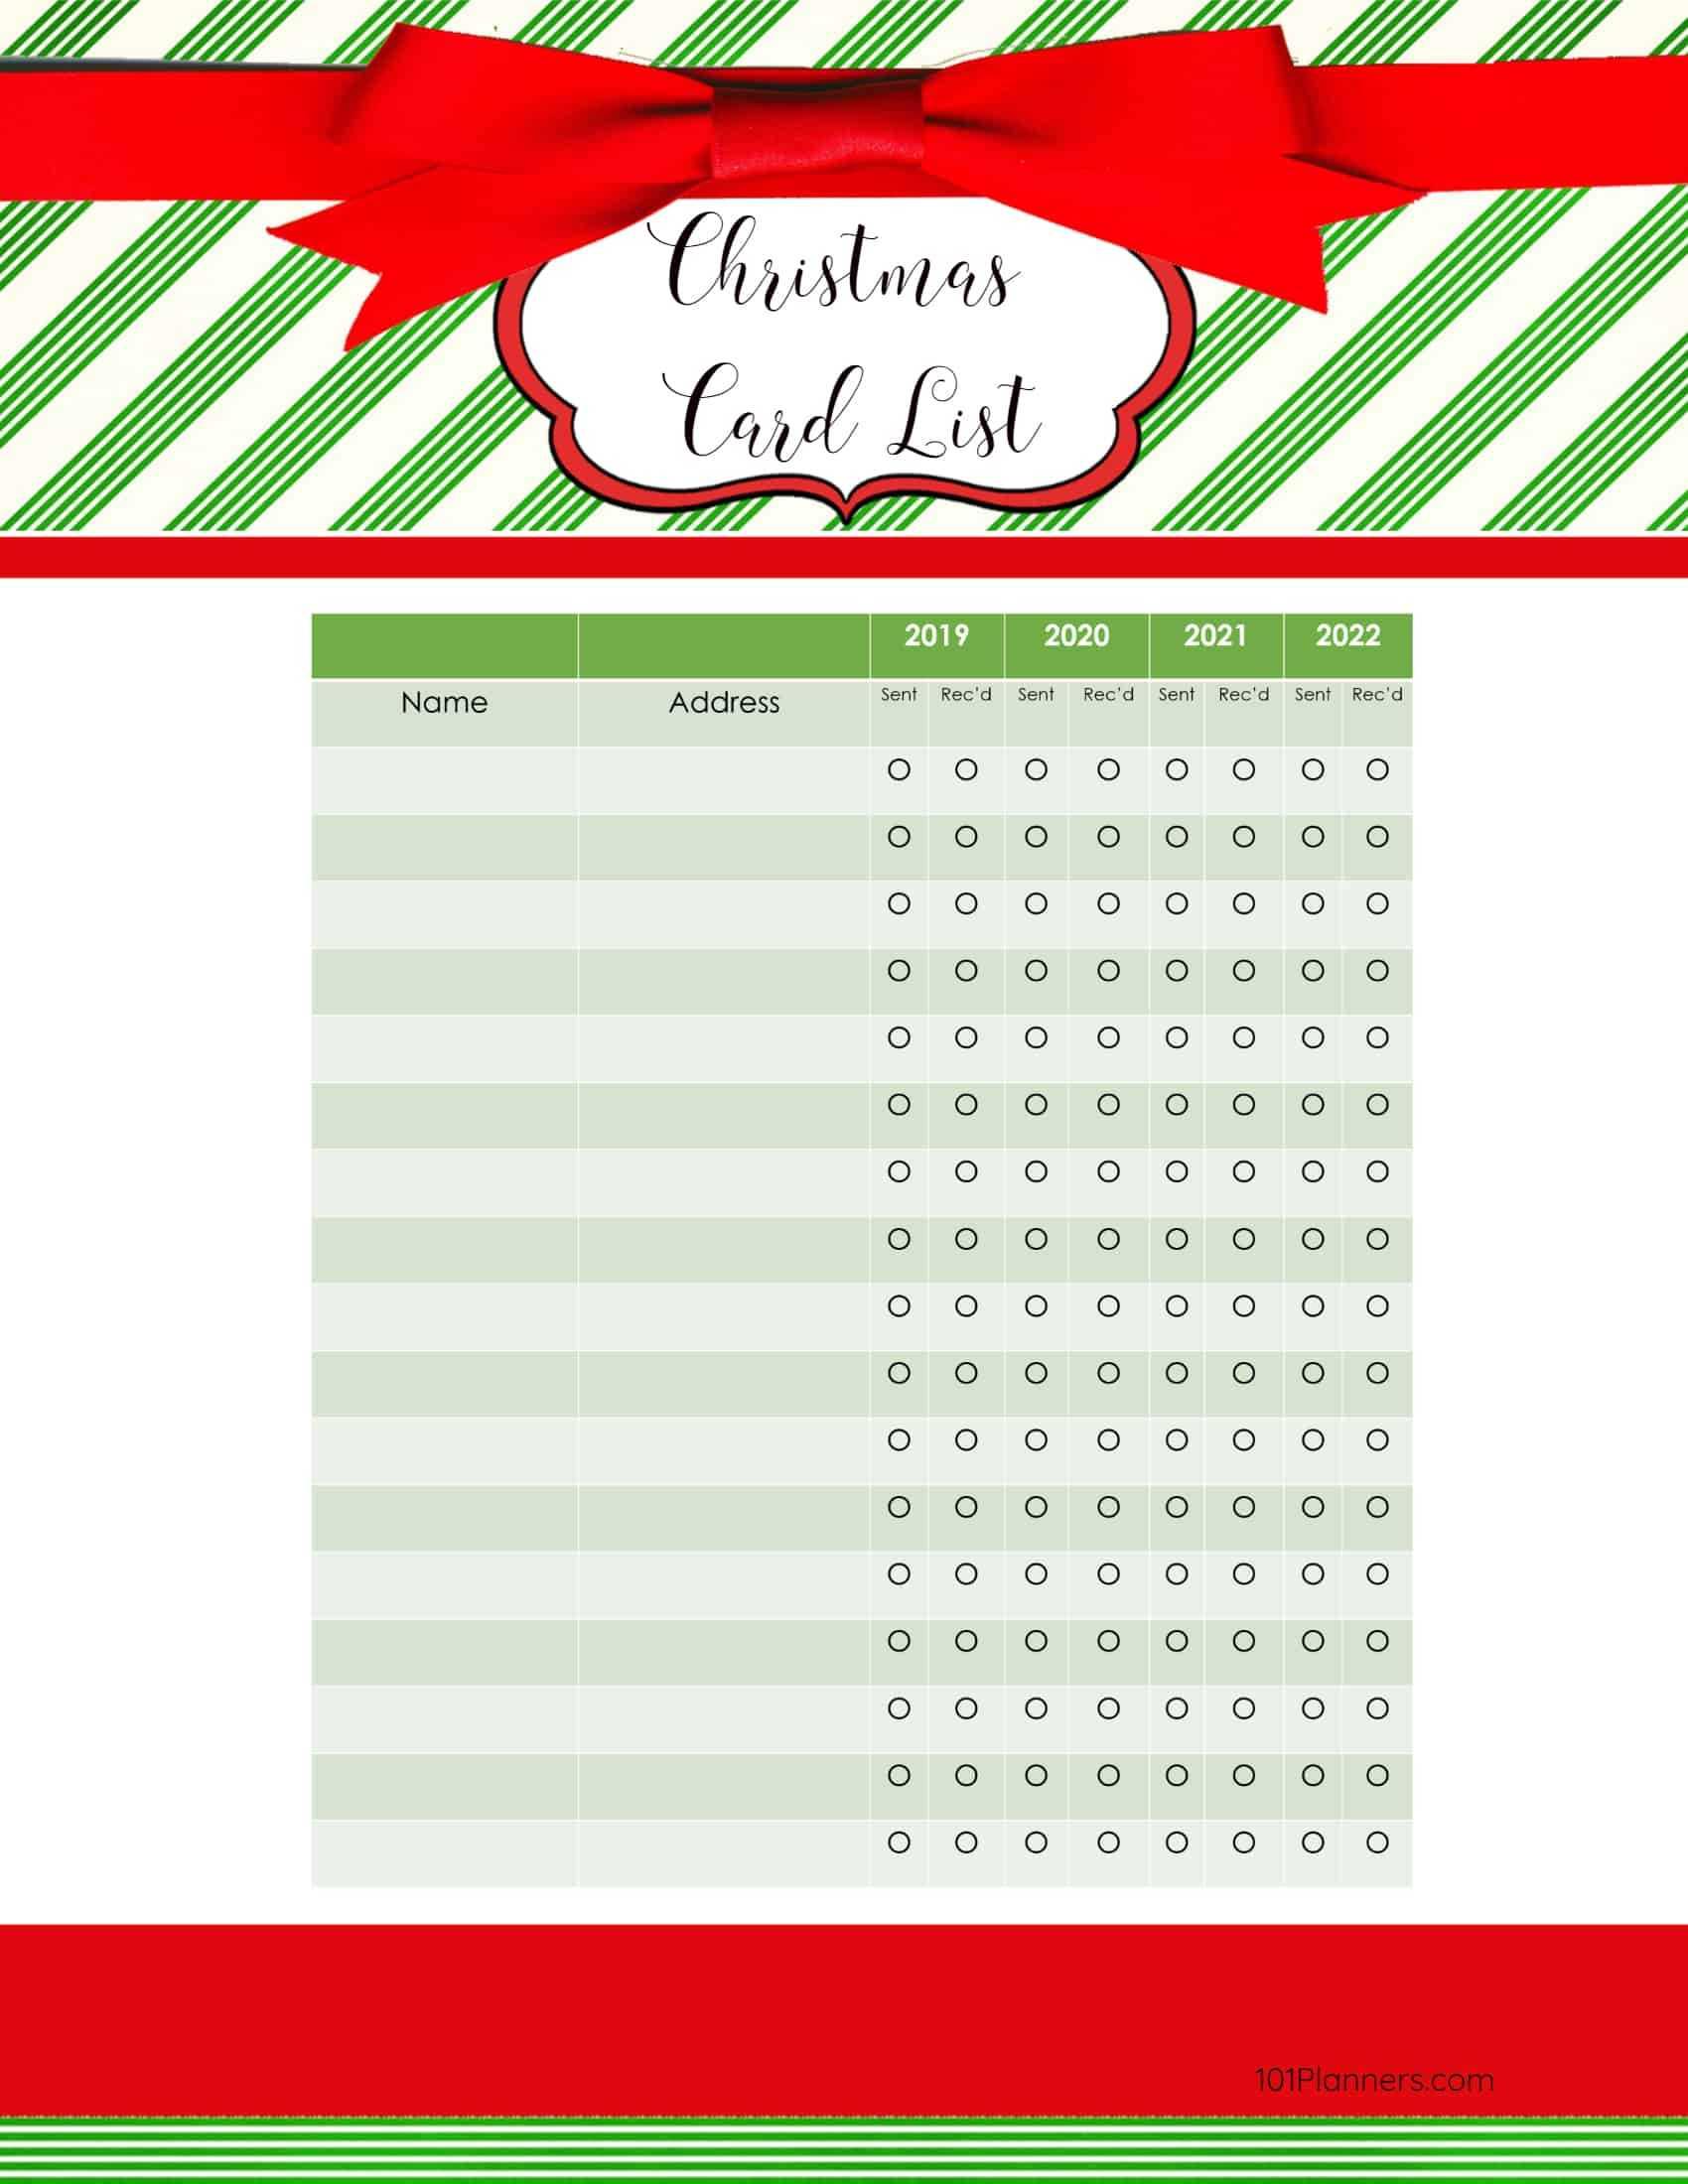 Free Printable Christmas Gift List Template Intended For Christmas Card List Template